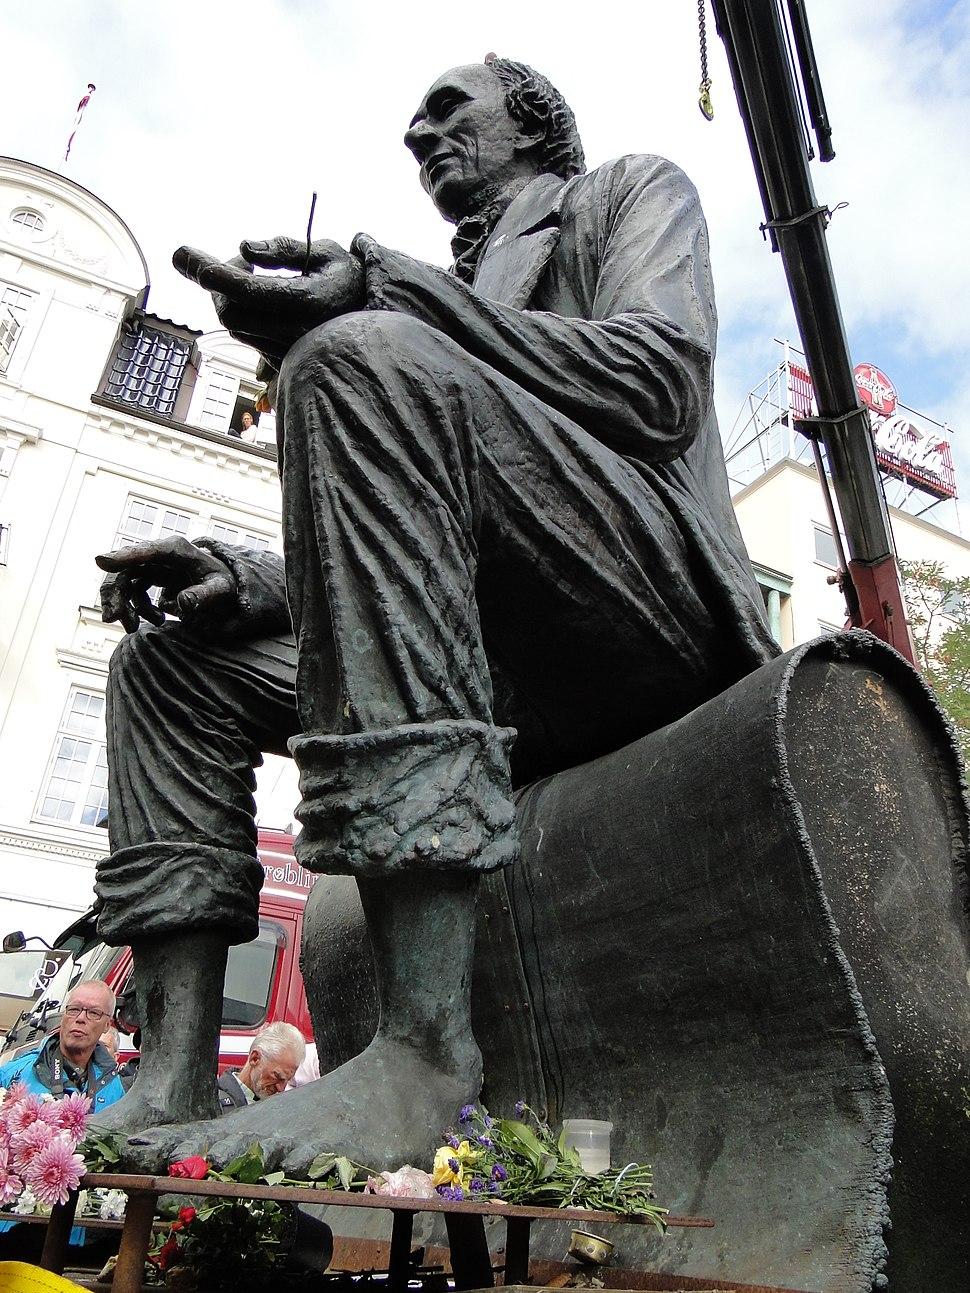 Sculpture Hans Christian Andersen in odense Harbor 3